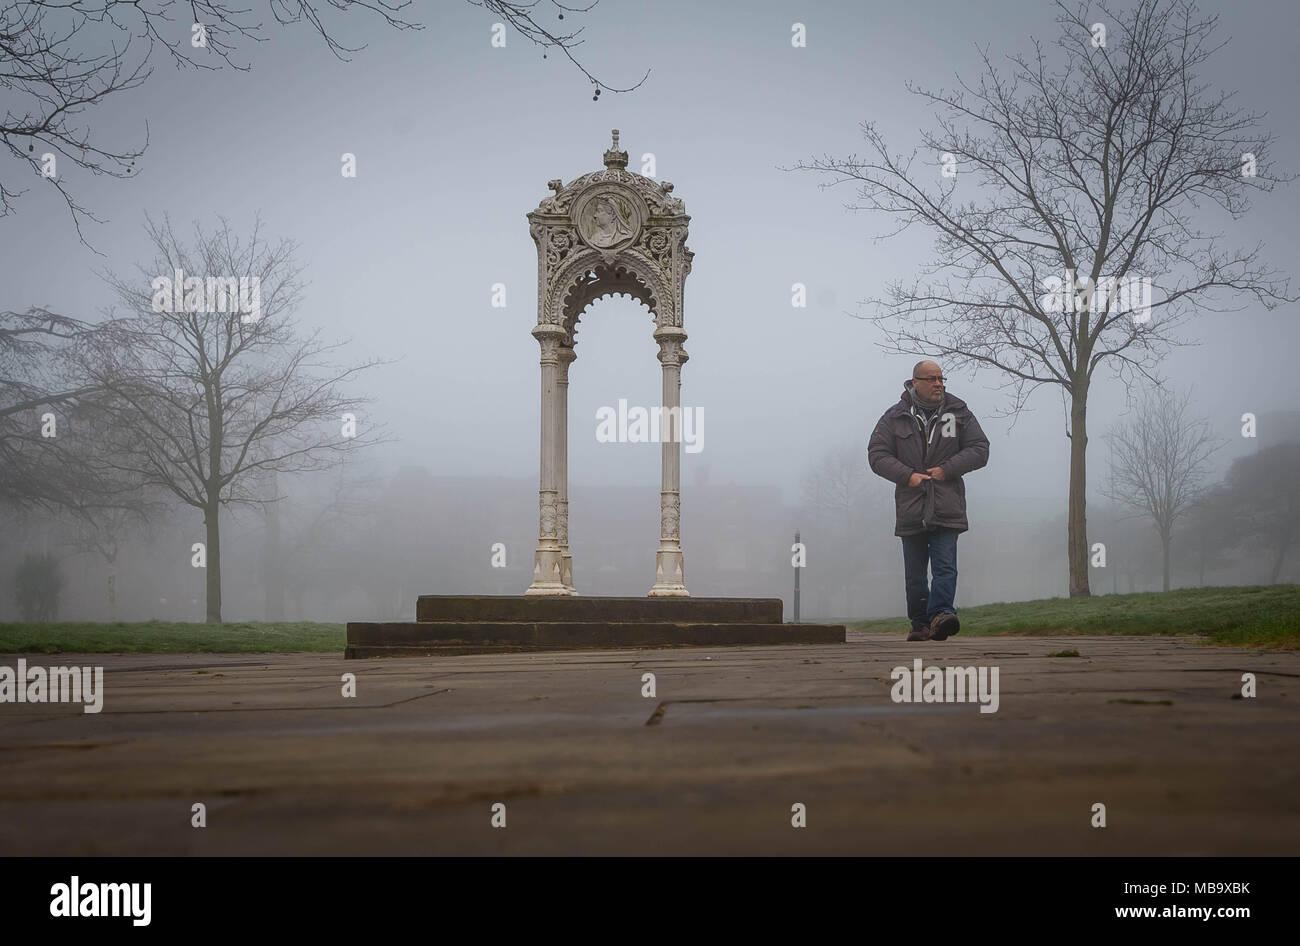 Warrington, Cheshire, UK. 9th April, 2018. Warrington, Cheshire , England, UK awoke to a foggy morning on 9th April 2018 Credit: John Hopkins/Alamy Live News Stock Photo